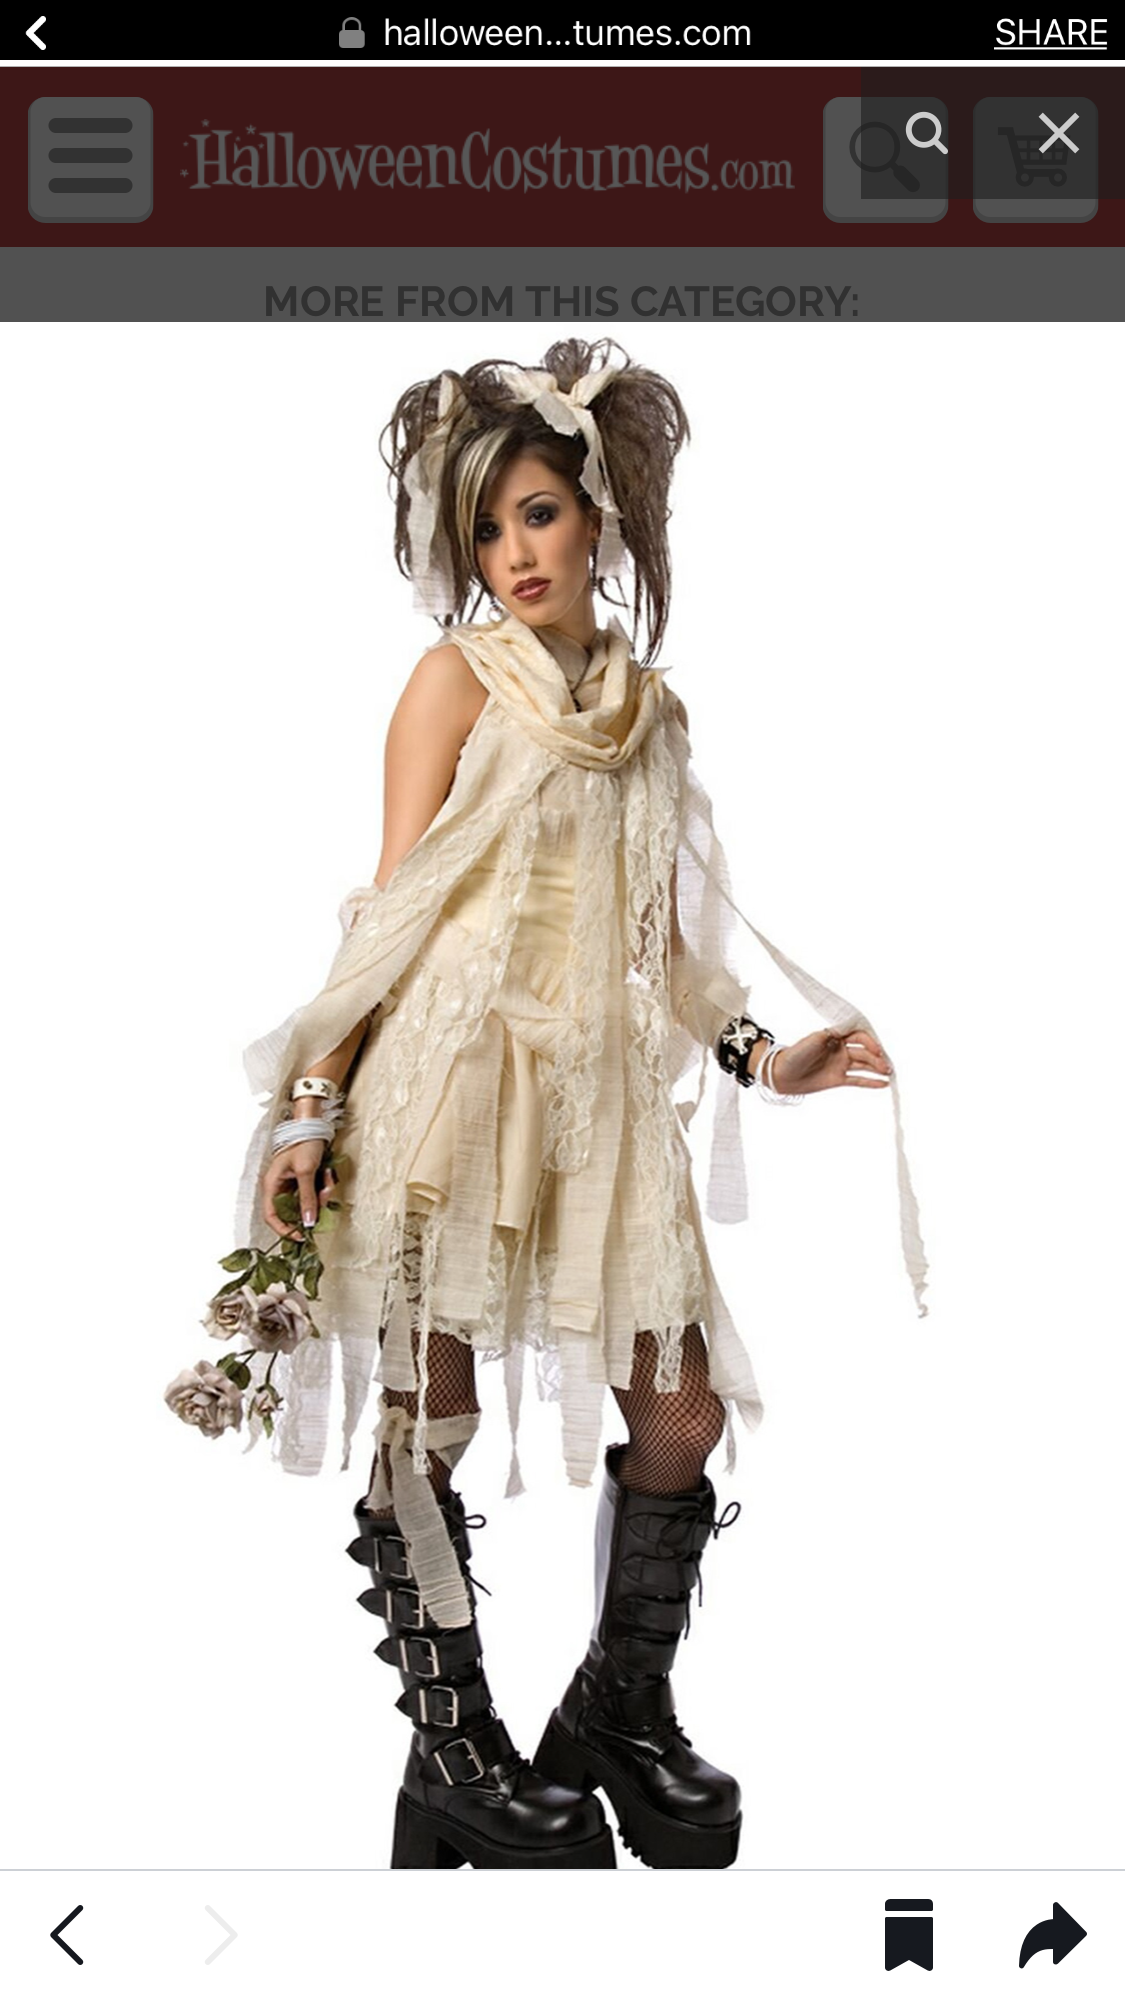 Pin by Kelly Kelley on Halloween Ideas Mummy costume